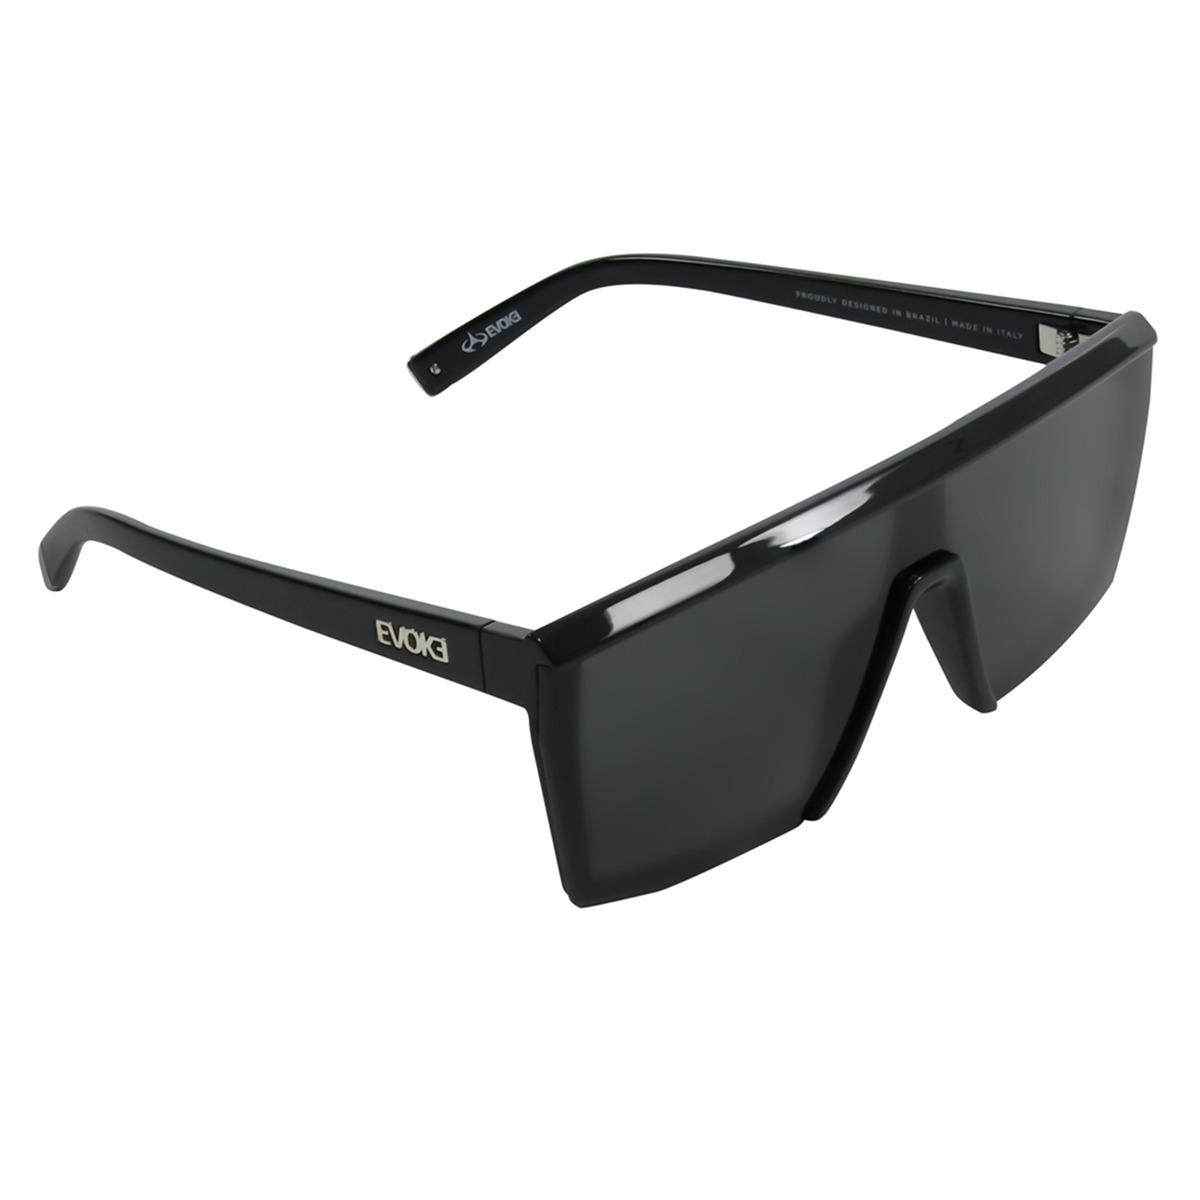 dedb14852b784 óculos evoke futurah a05 preto. Carregando zoom.